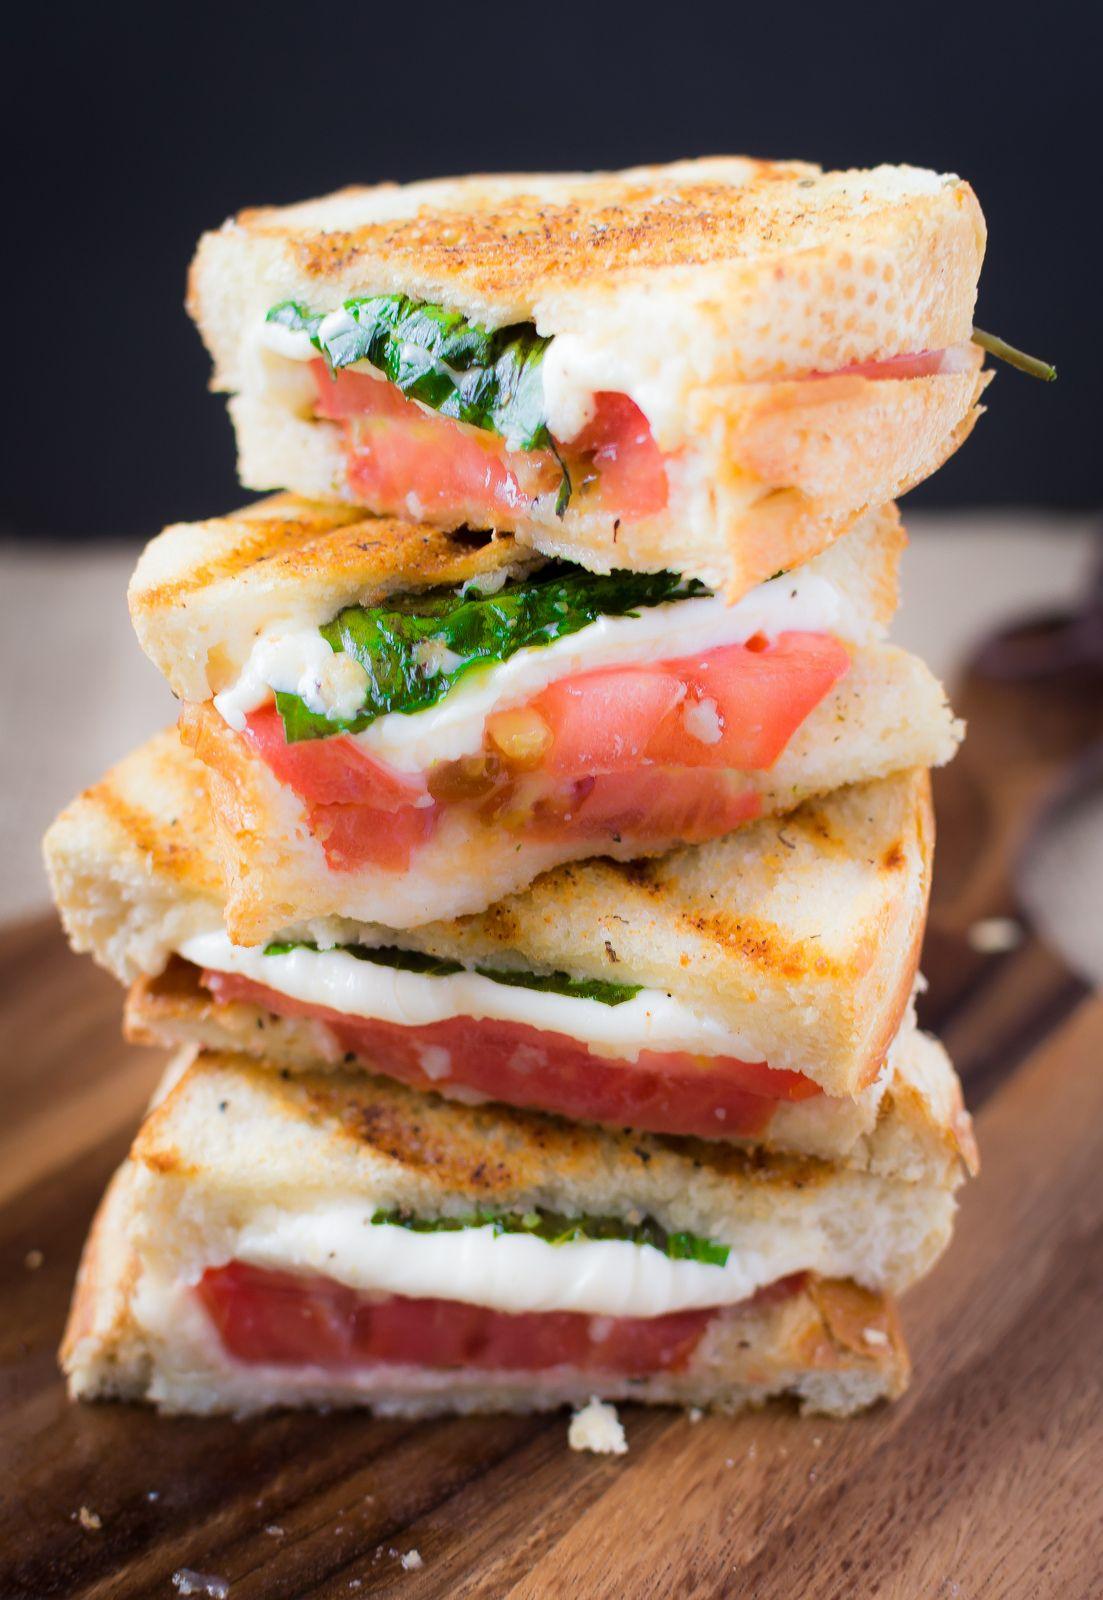 Margherita panini with garlic